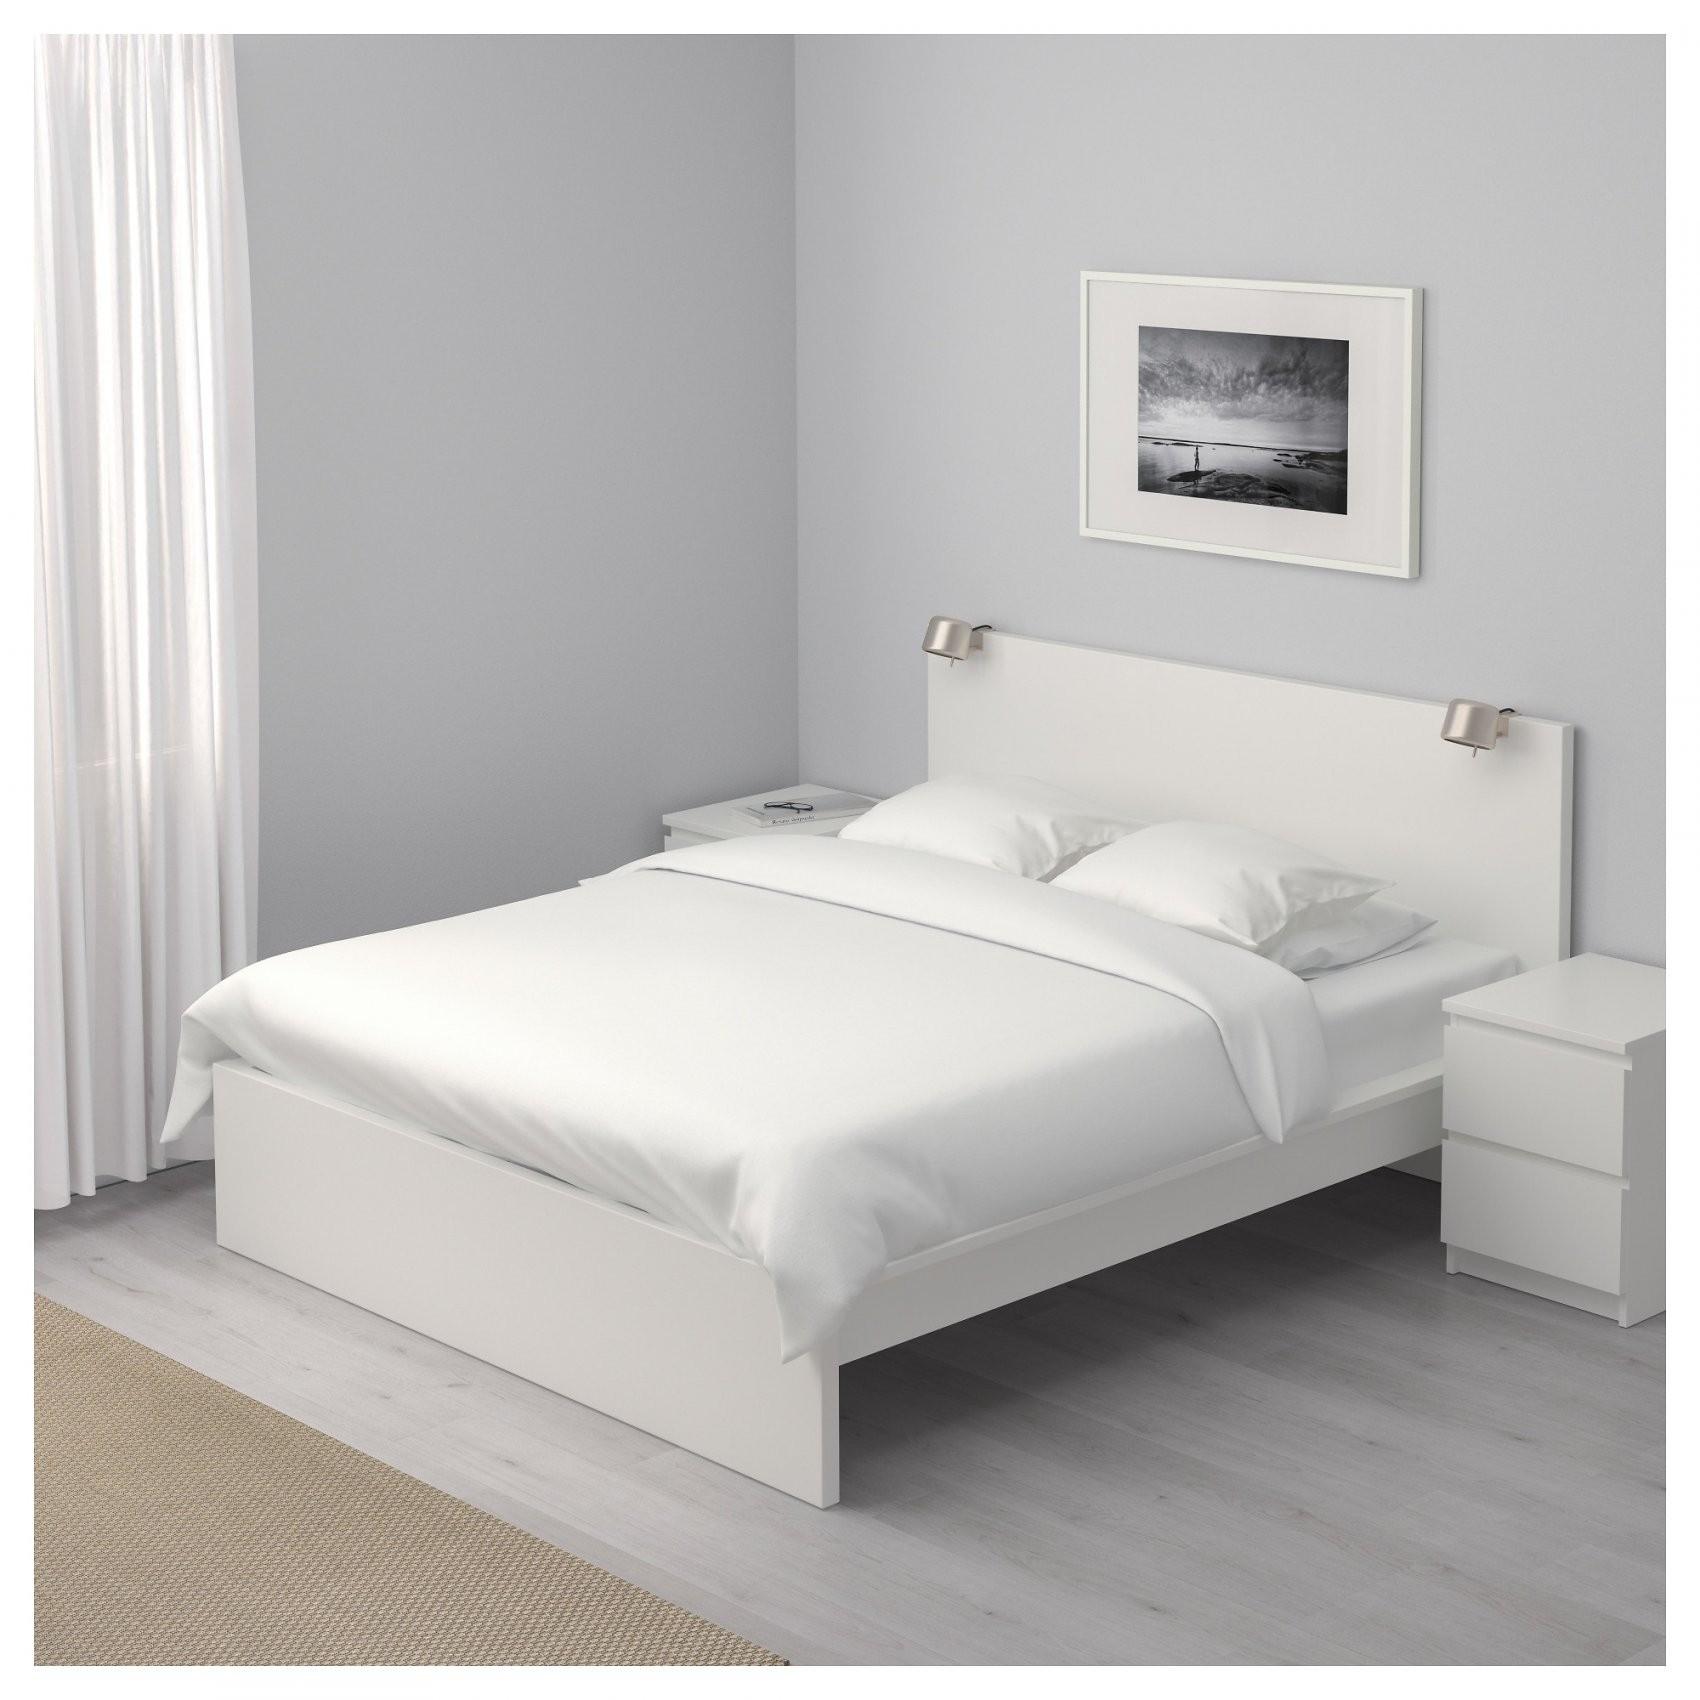 Malm Bettgestell Hoch  140X200 Cm  Weiß  Ikea von Ikea Bett Malm 140X200 Weiß Photo